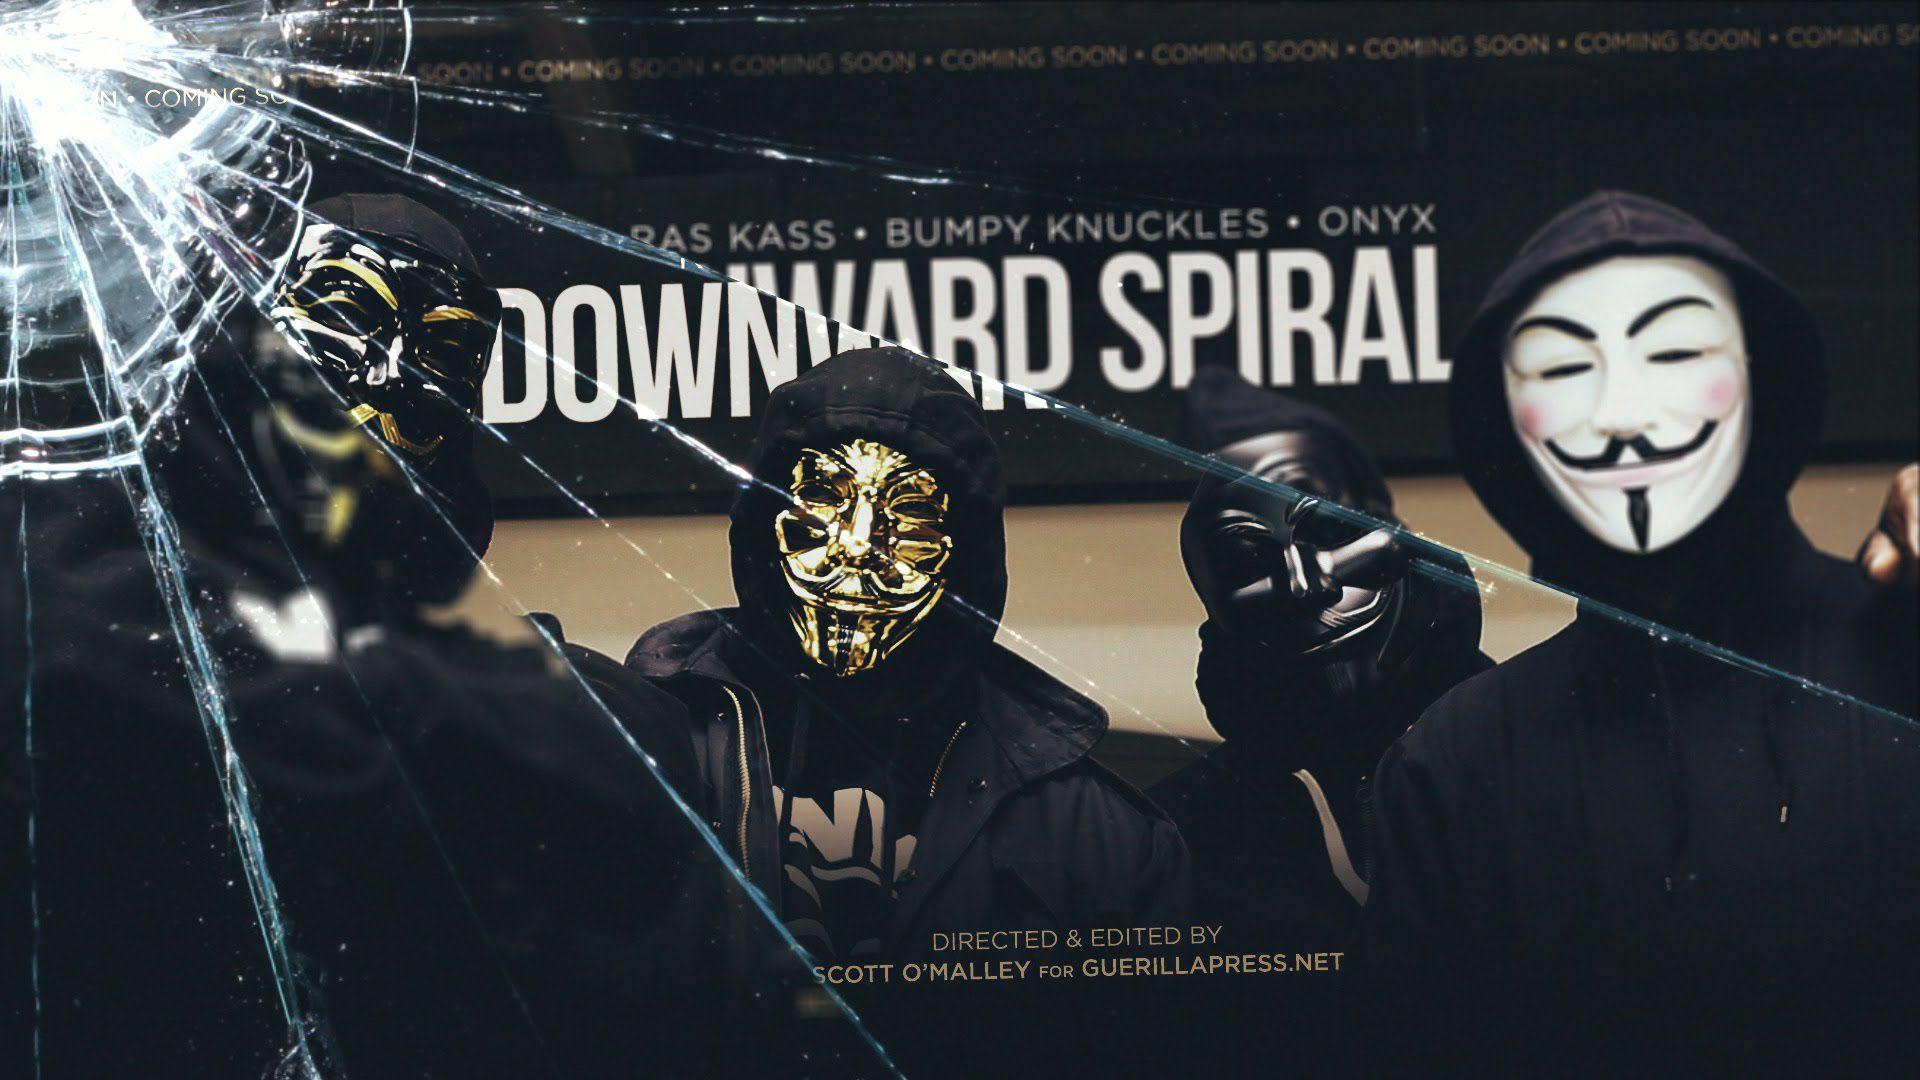 Ras Kass Drops New Video - Downward Spiral Ft. Bumpy Knuckles & Onyx